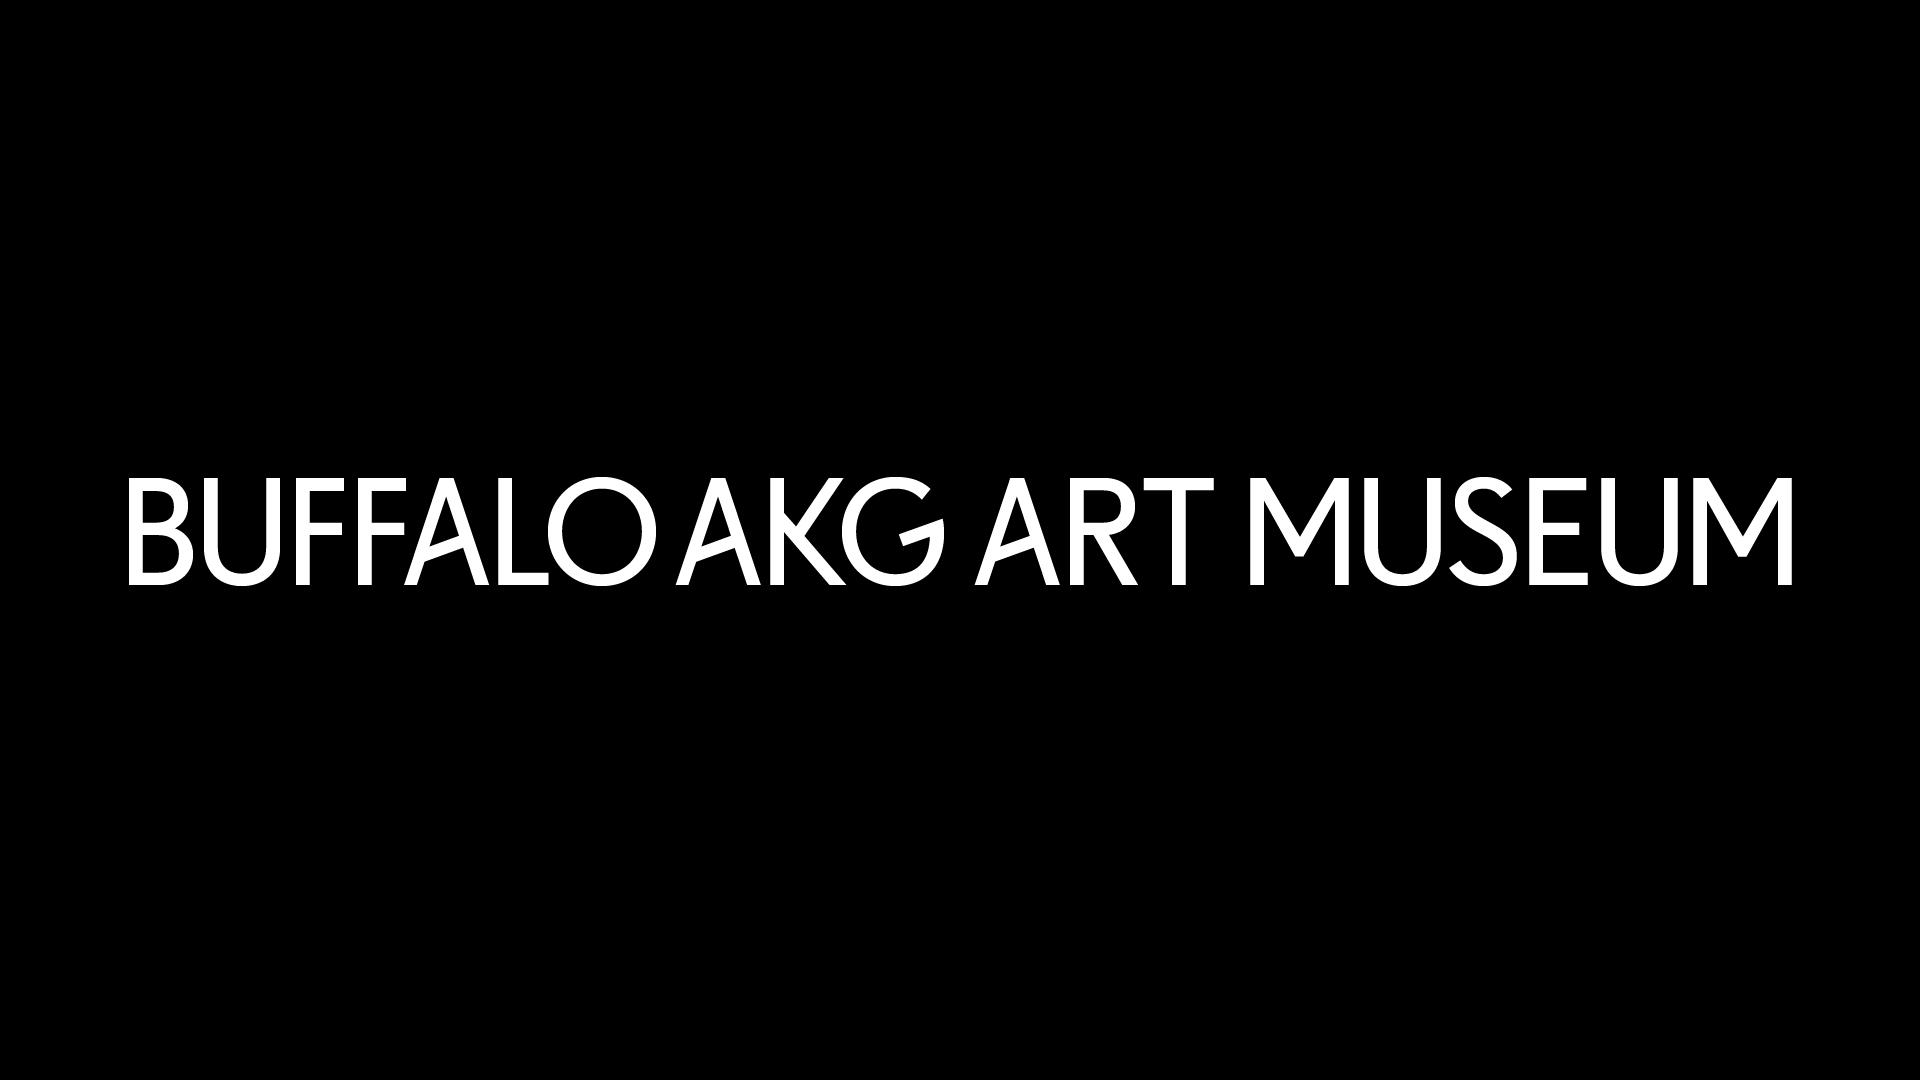 Buffalo AKG Art Museum